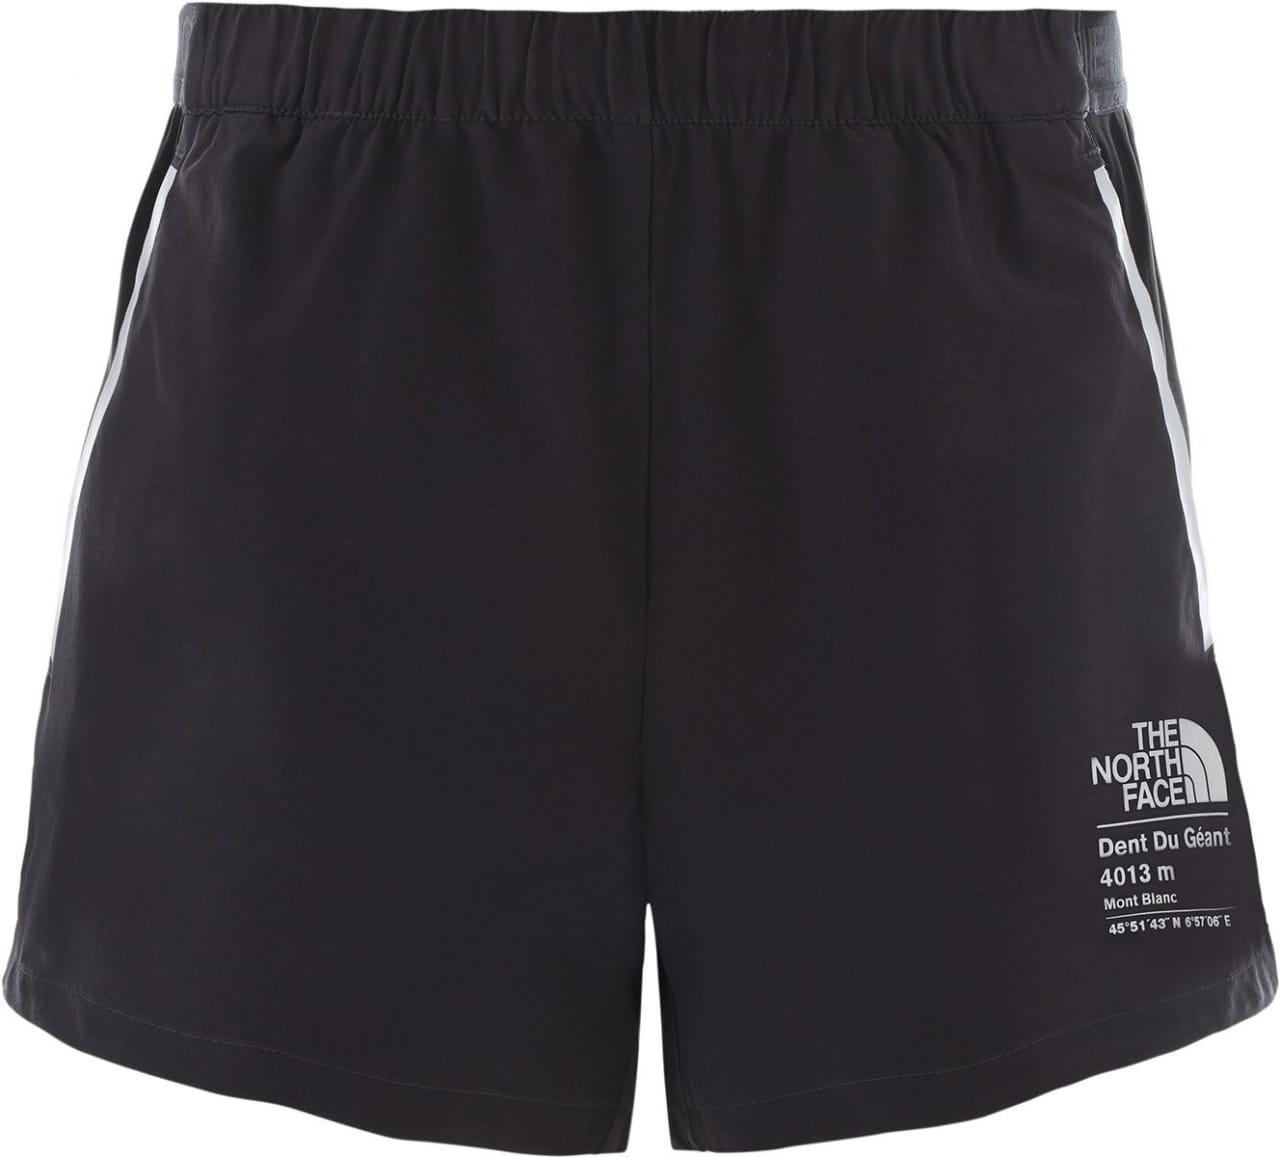 Shorts The North Face Women's Glacier Shorts